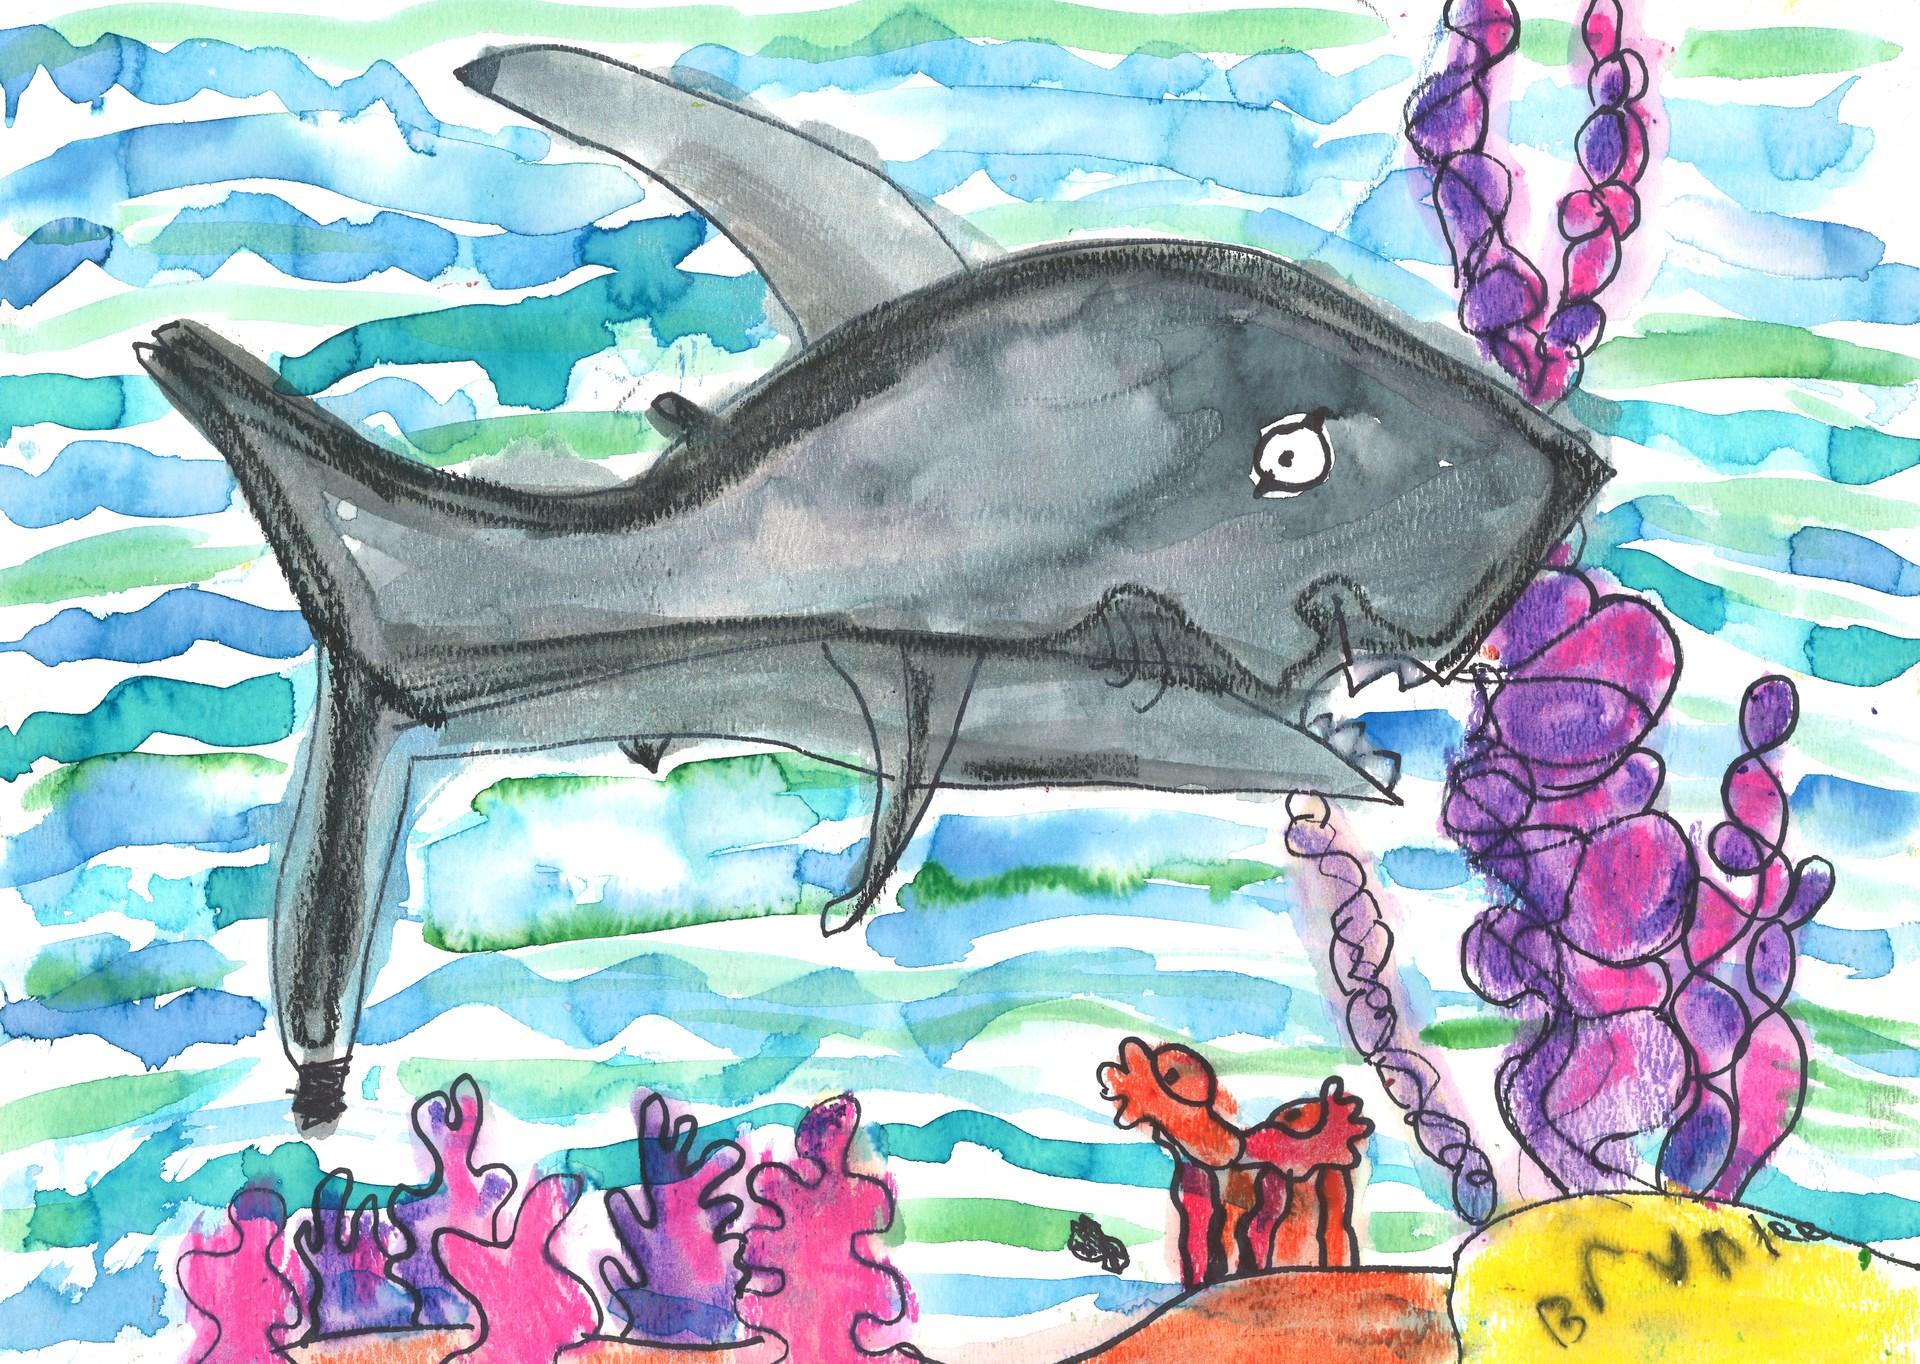 1st Grader fish and ocean